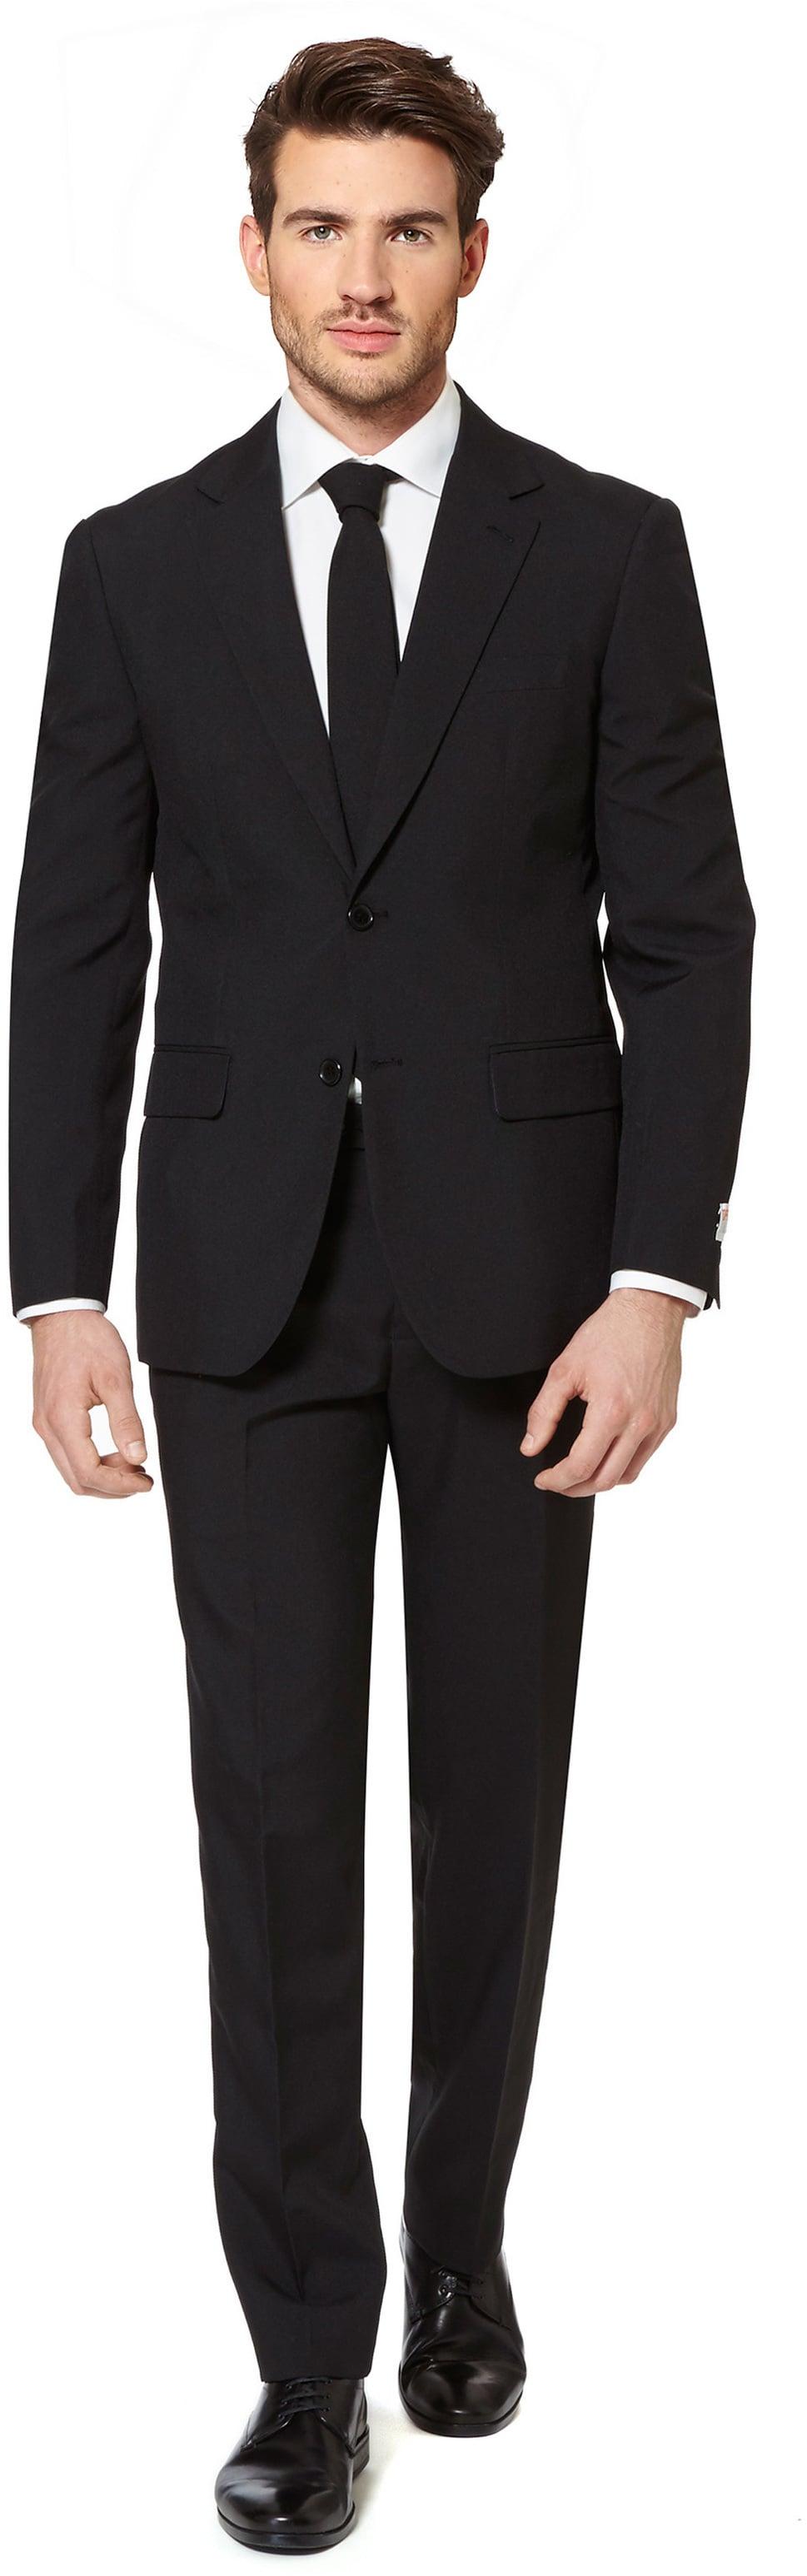 OppoSuits Black Knight Anzug foto 0